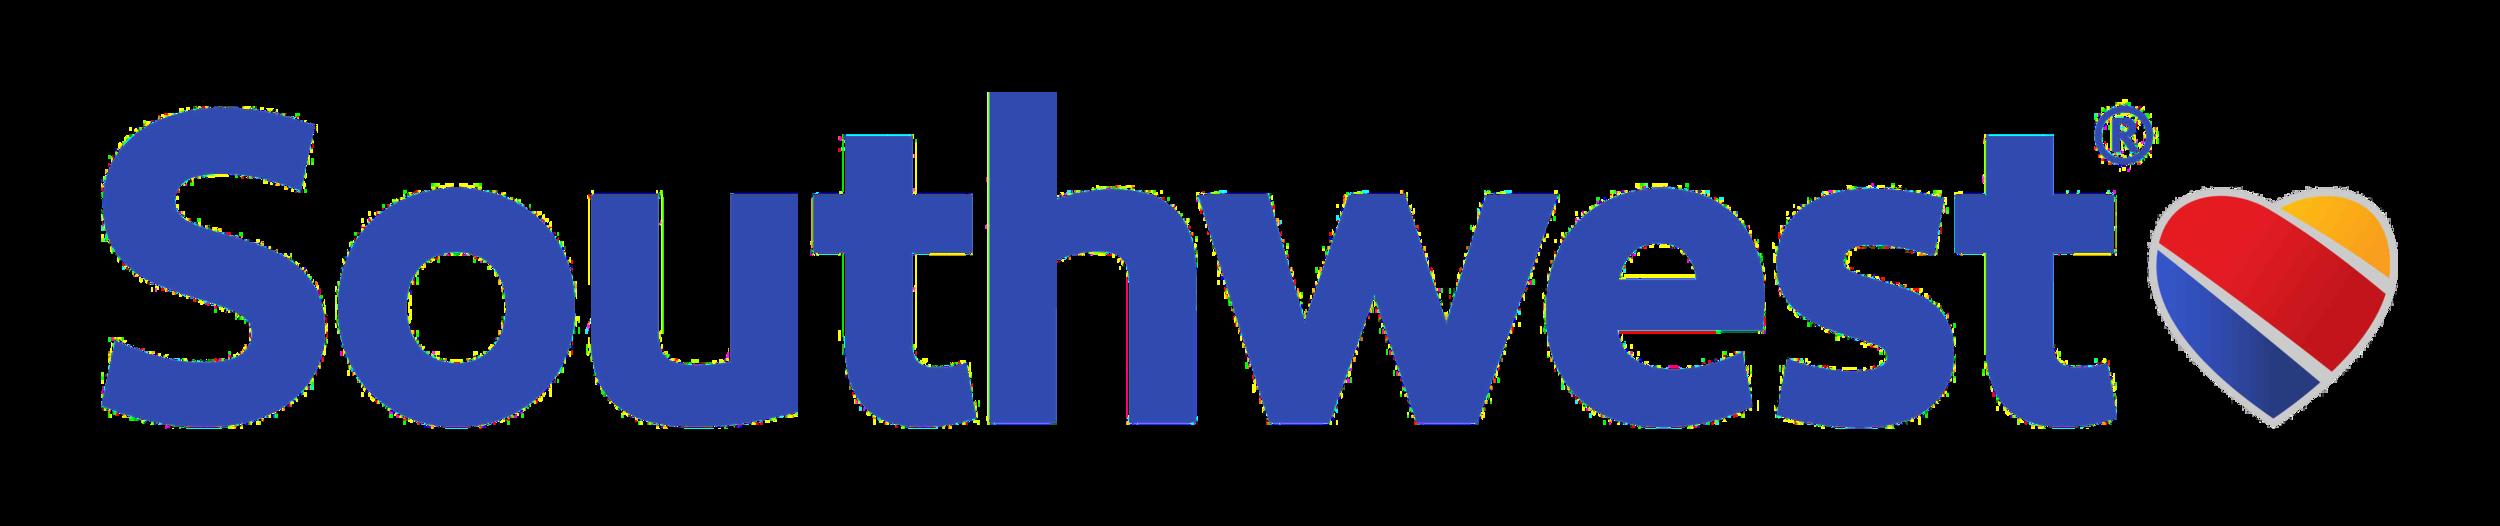 Southwest-Airlines-Logo-PNG-Transparent.png